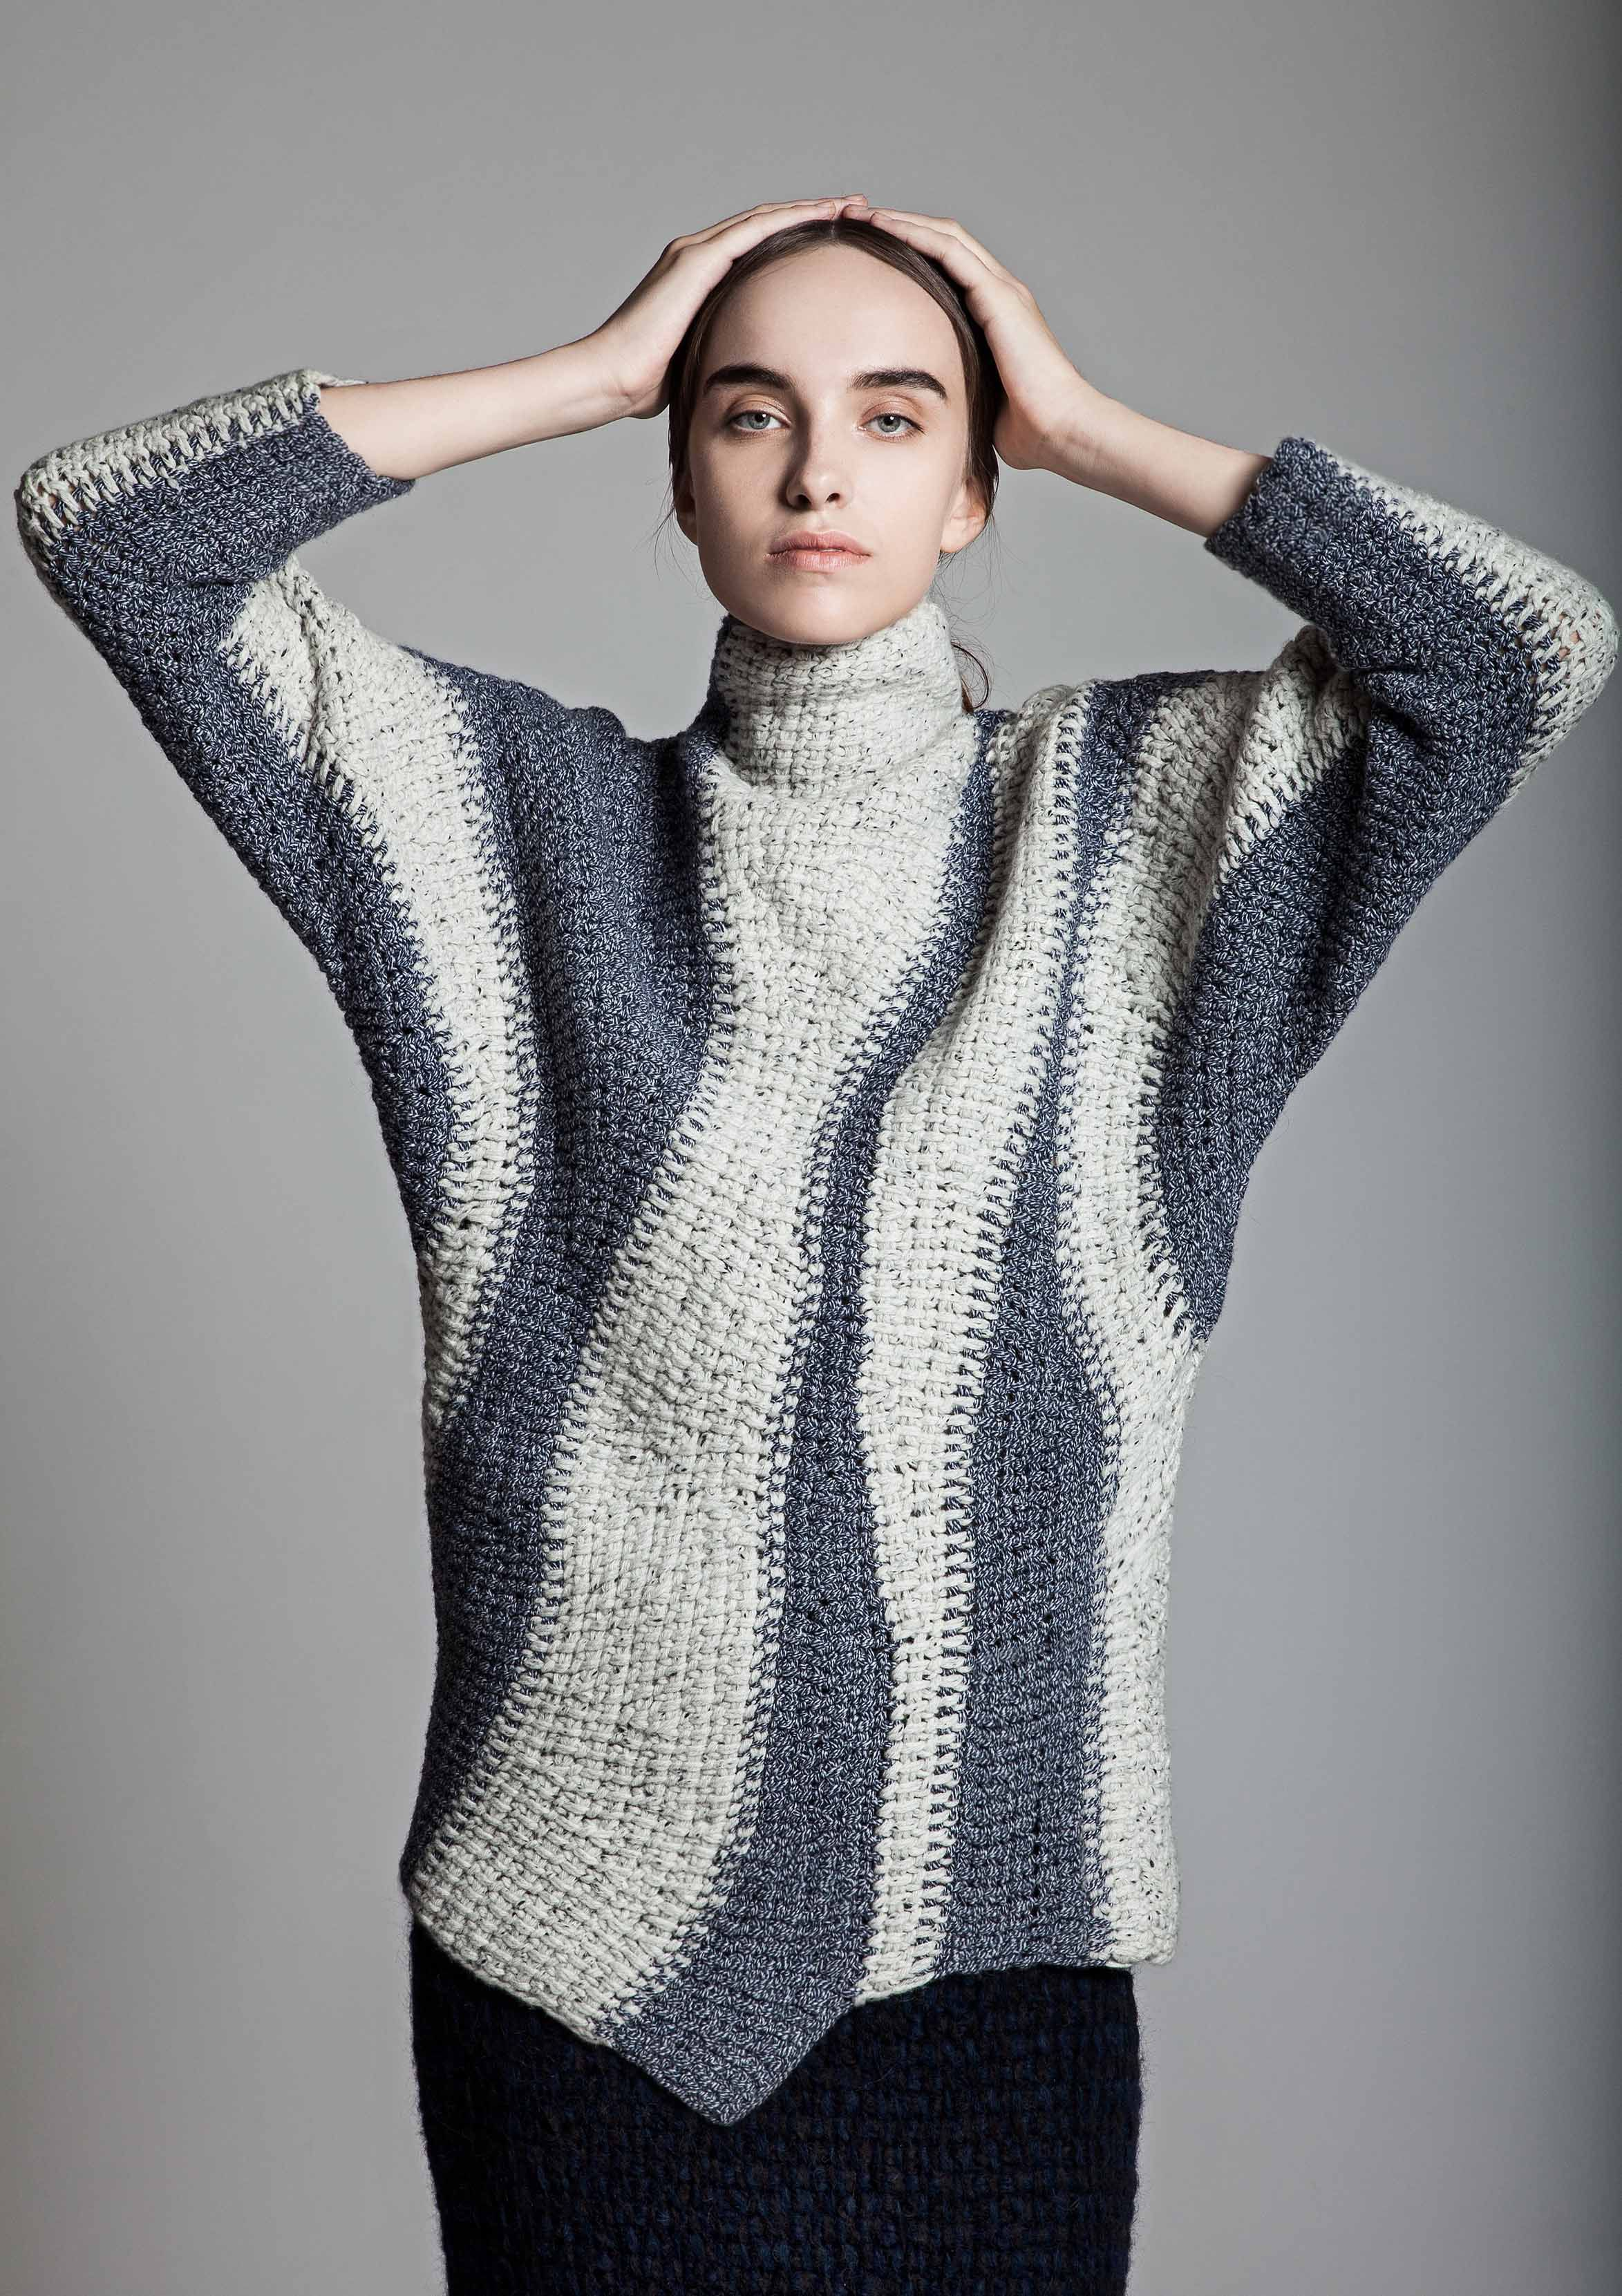 Wow fashion designer uses tunisian crochet sungheebang aw2015 fashion designer uses tunisian crochet sungheebang aw2015 bankloansurffo Images